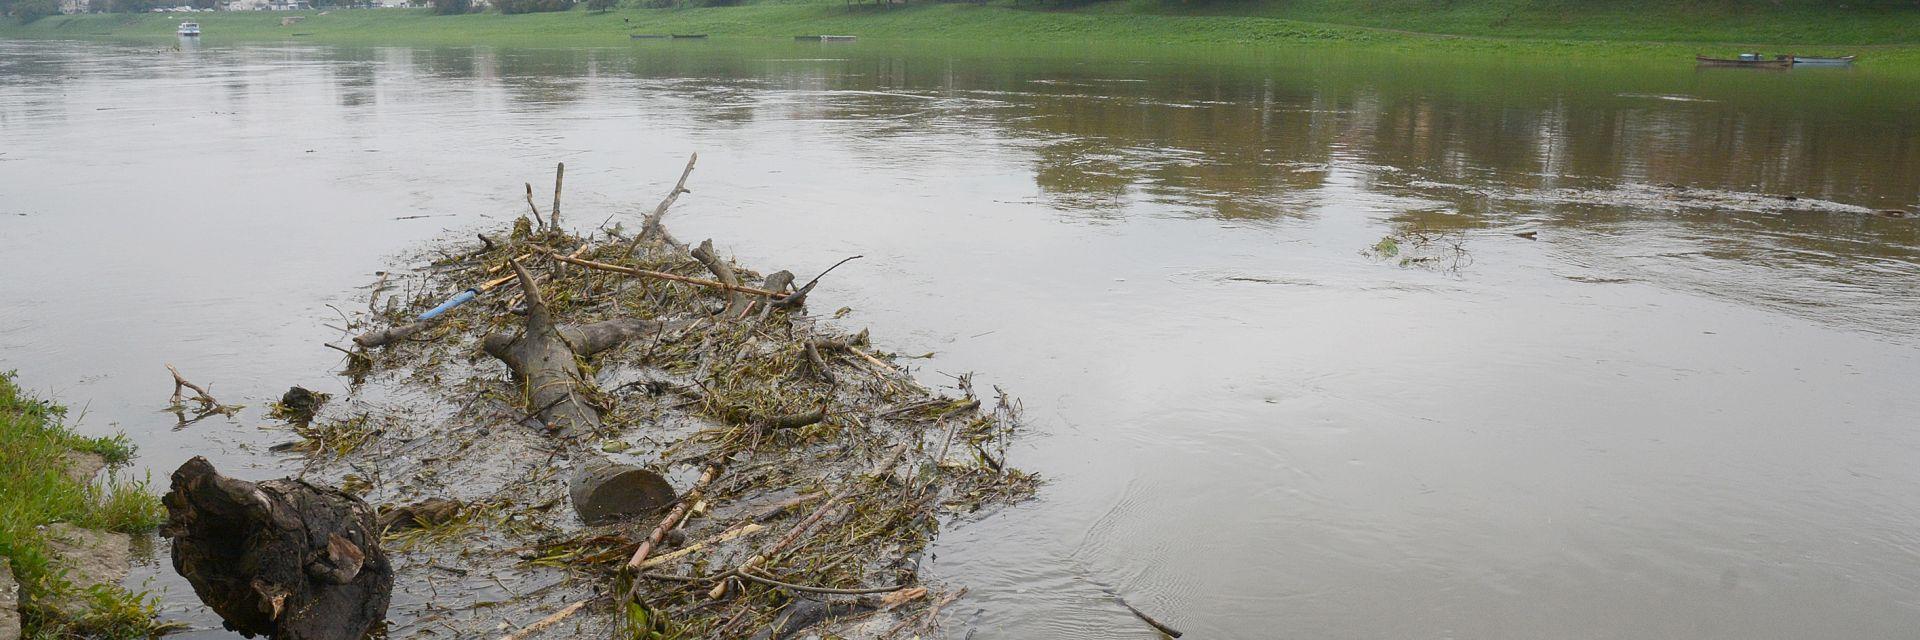 OBILNE KIŠE: Vodostaji rastu, ali straha od poplava za sada nema